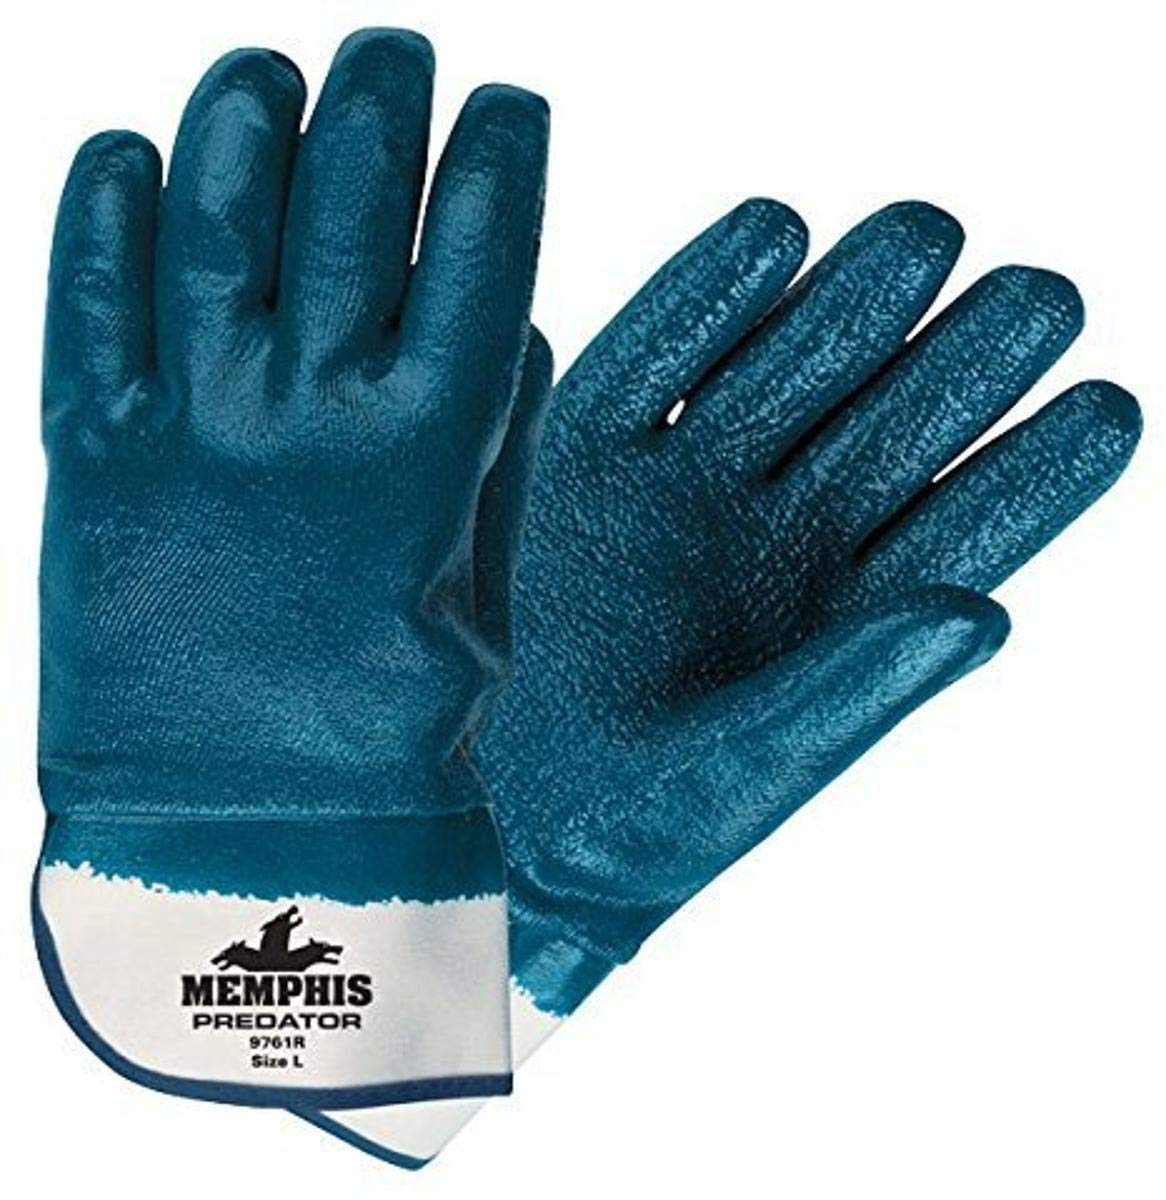 Memphis Glove 9761R Predator Nitrile Phoenix Mall Fully Popular product Coated